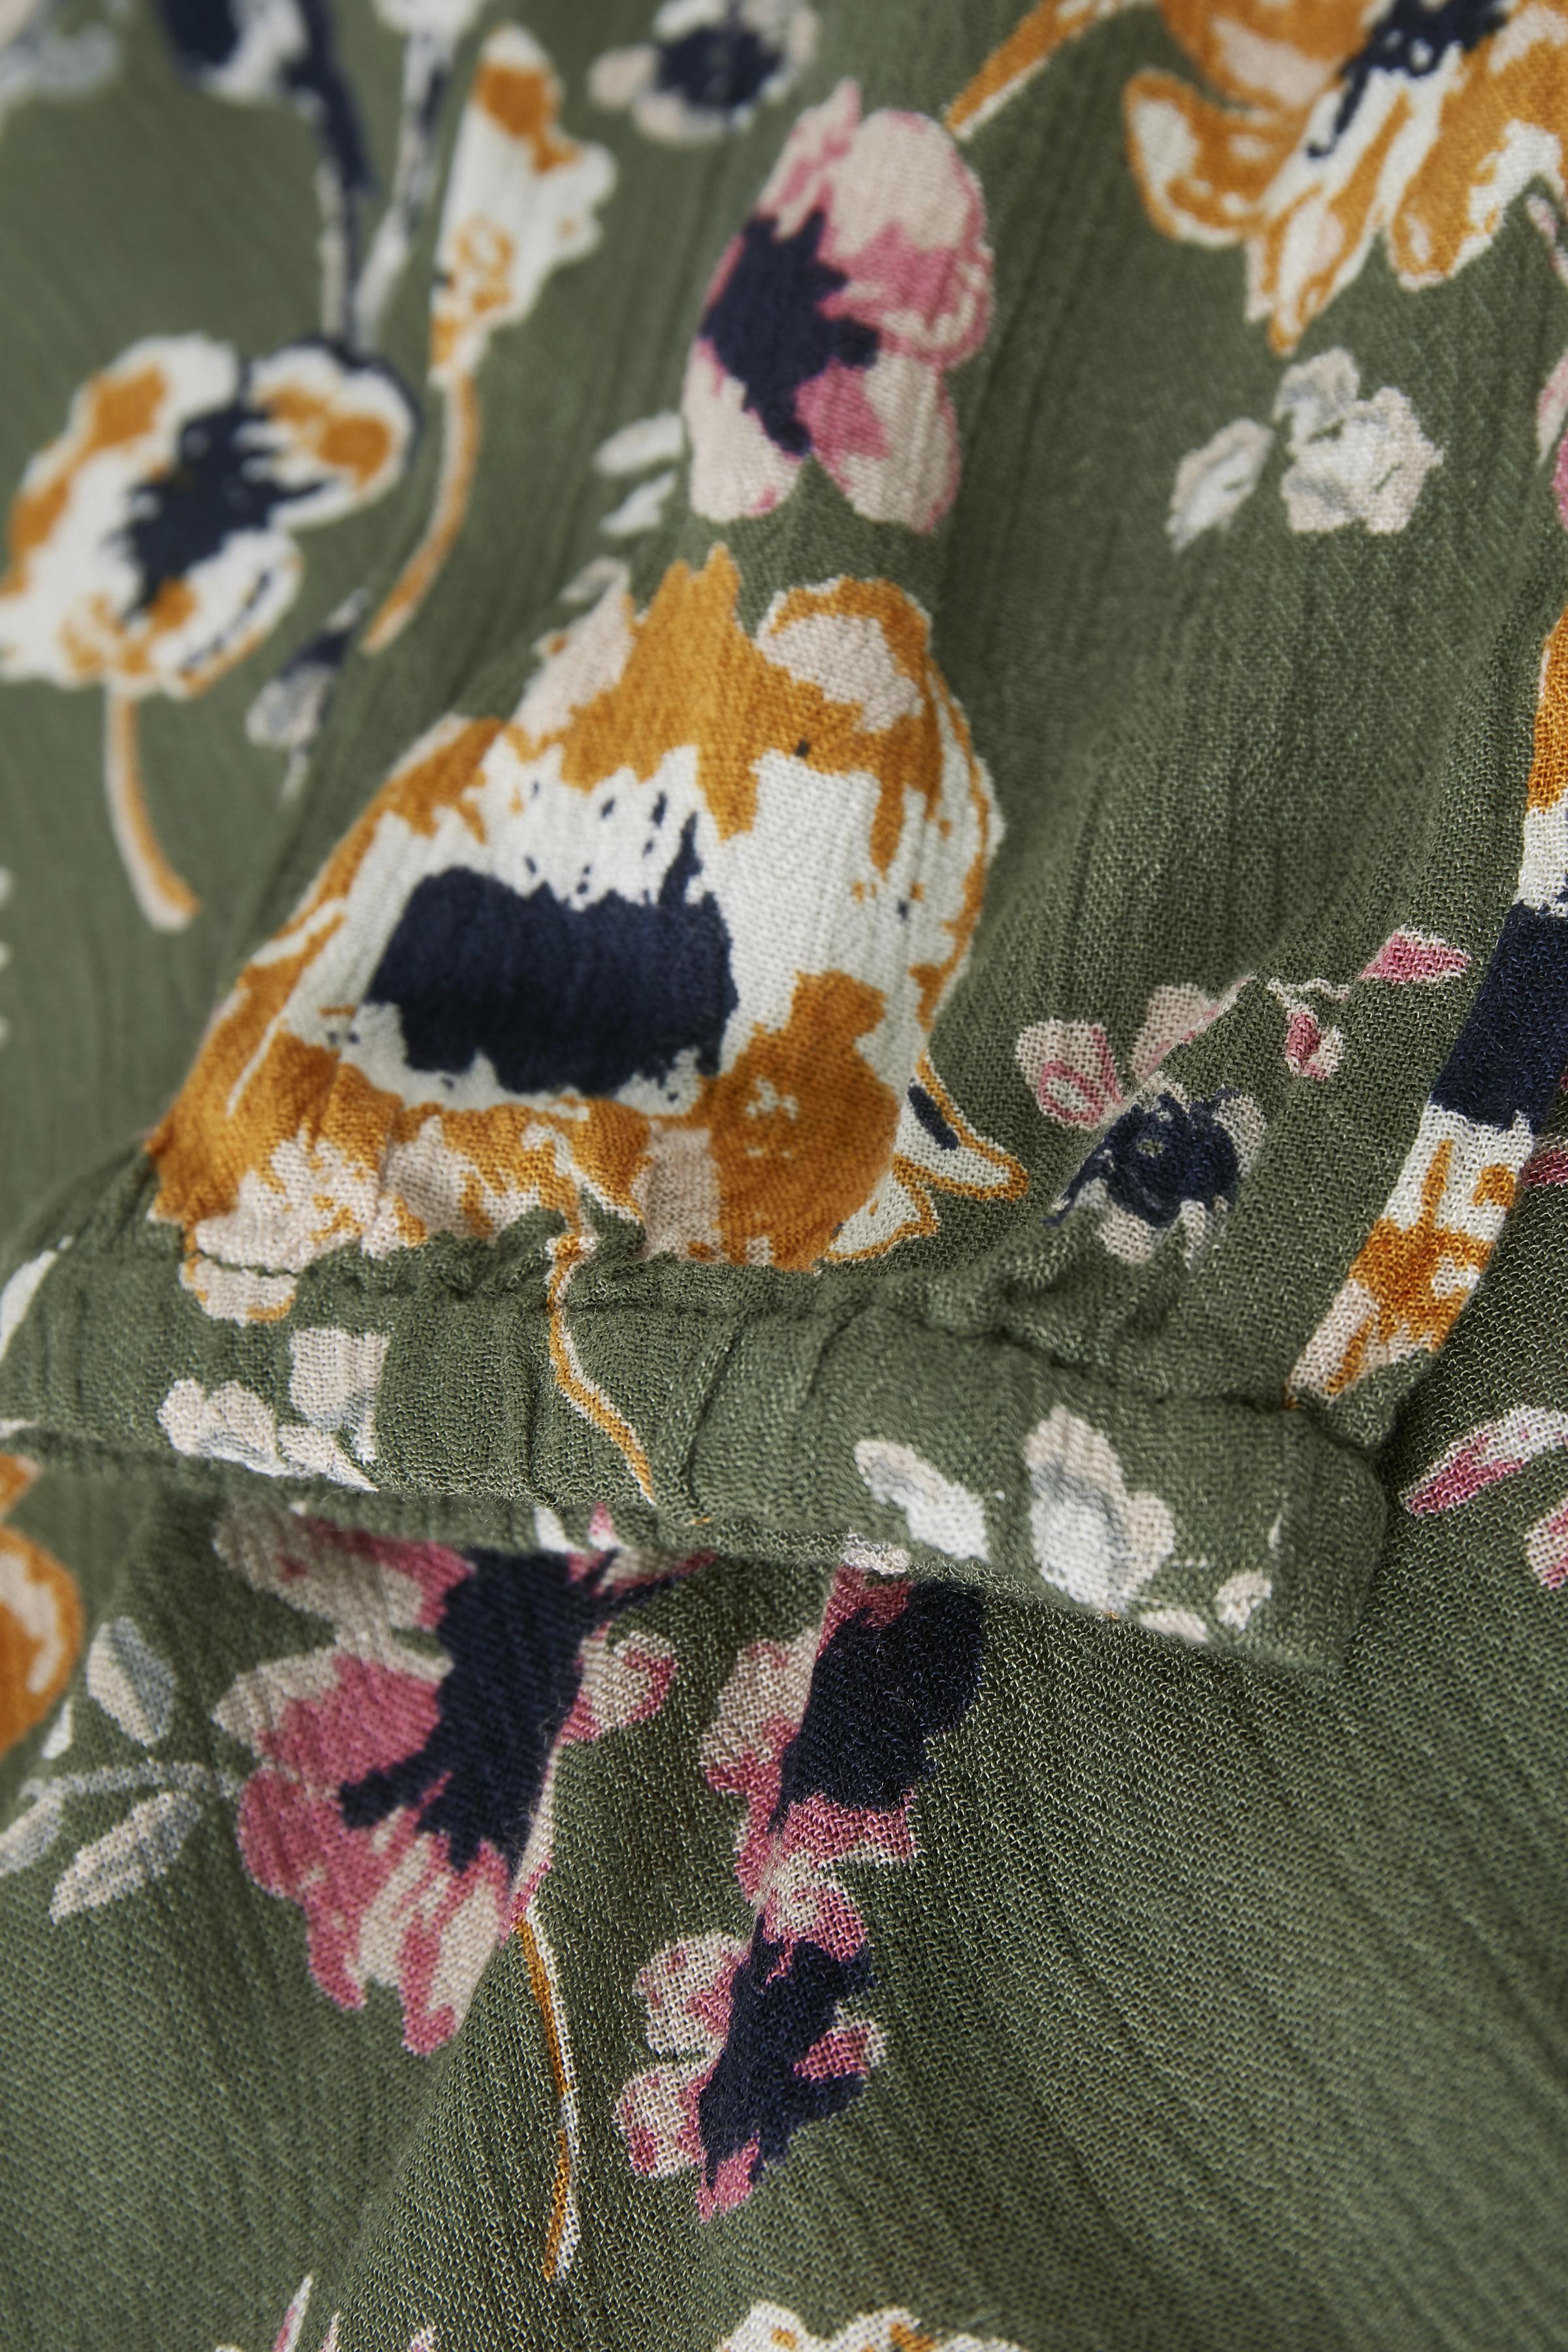 Lichtolijf Lange mouwen shirt  van Bon'A Parte – Door Lichtolijf Lange mouwen shirt  van maat. S-2XL hier